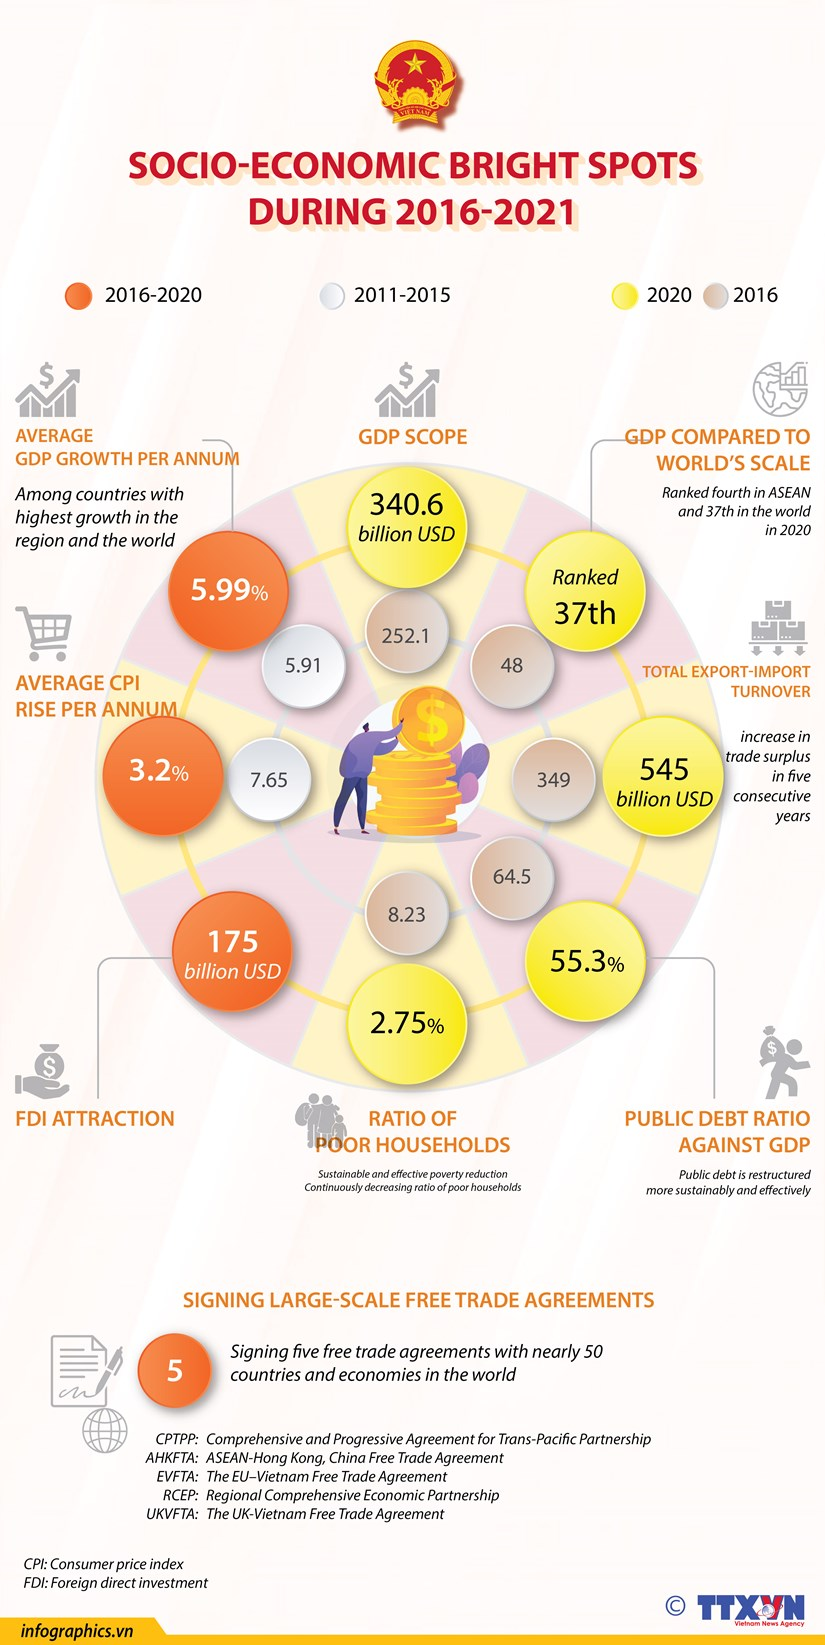 Socio-economic bright spots during 2016-2021 hinh anh 1